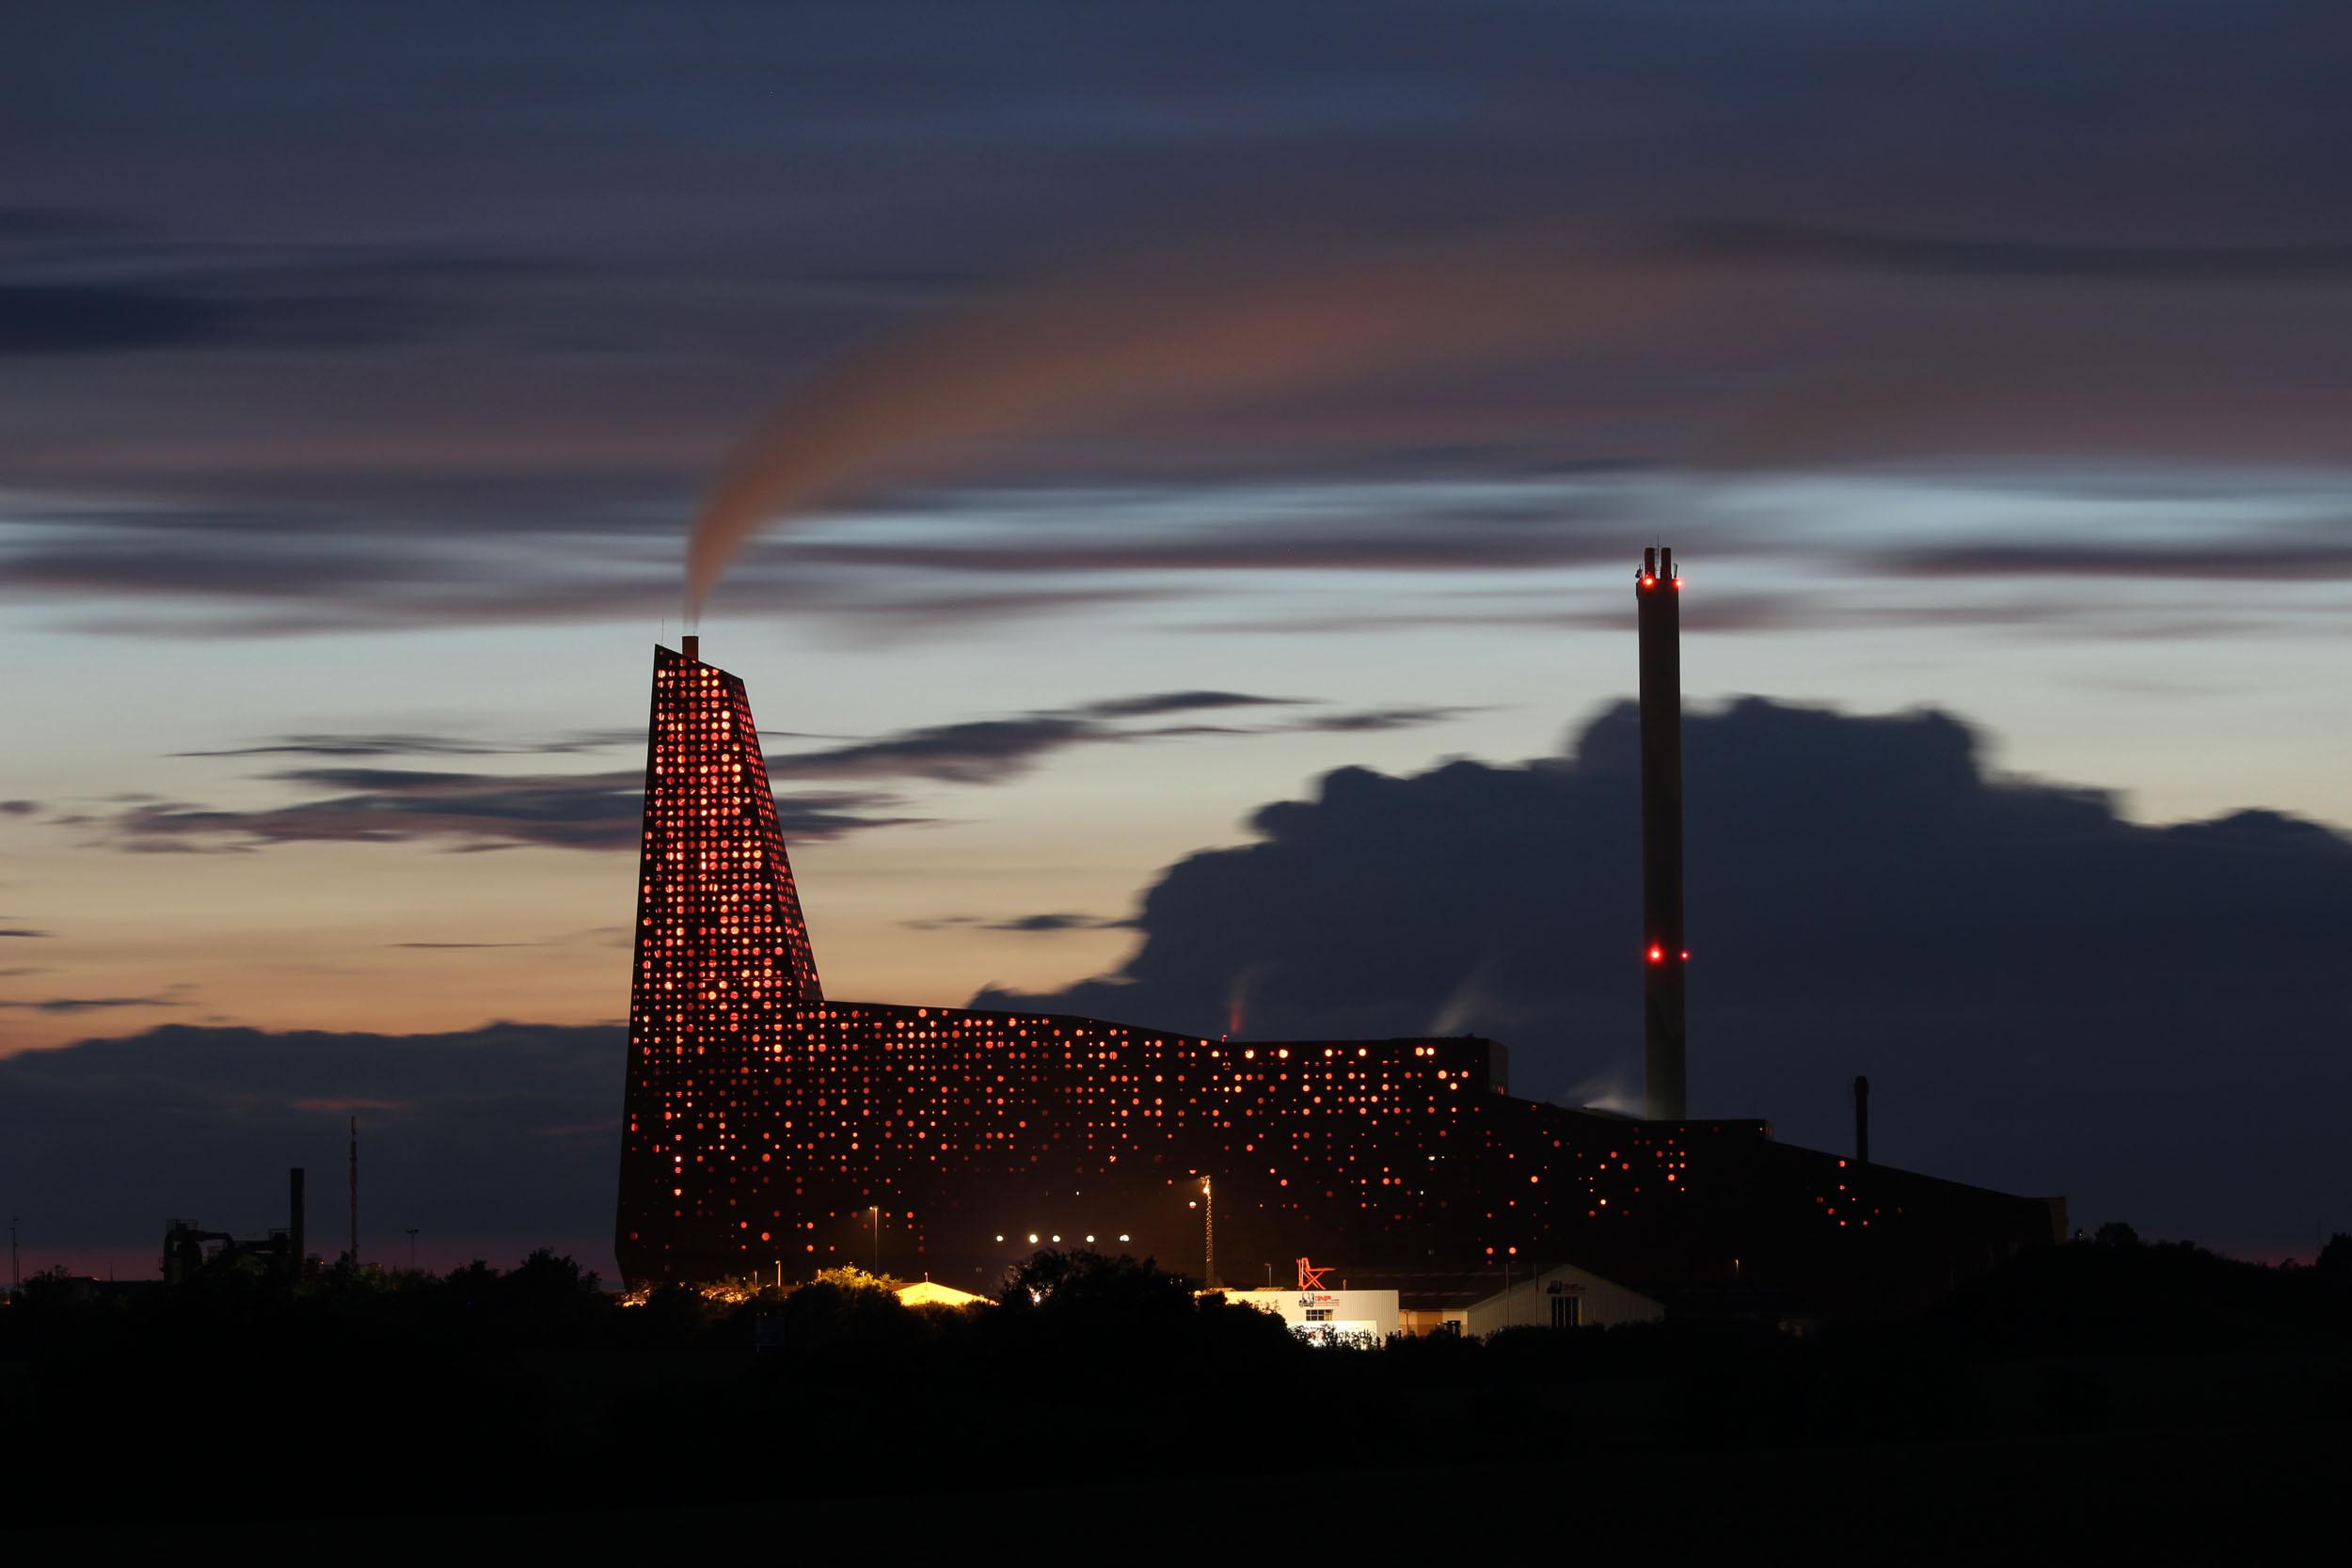 roskilde_energy-tower